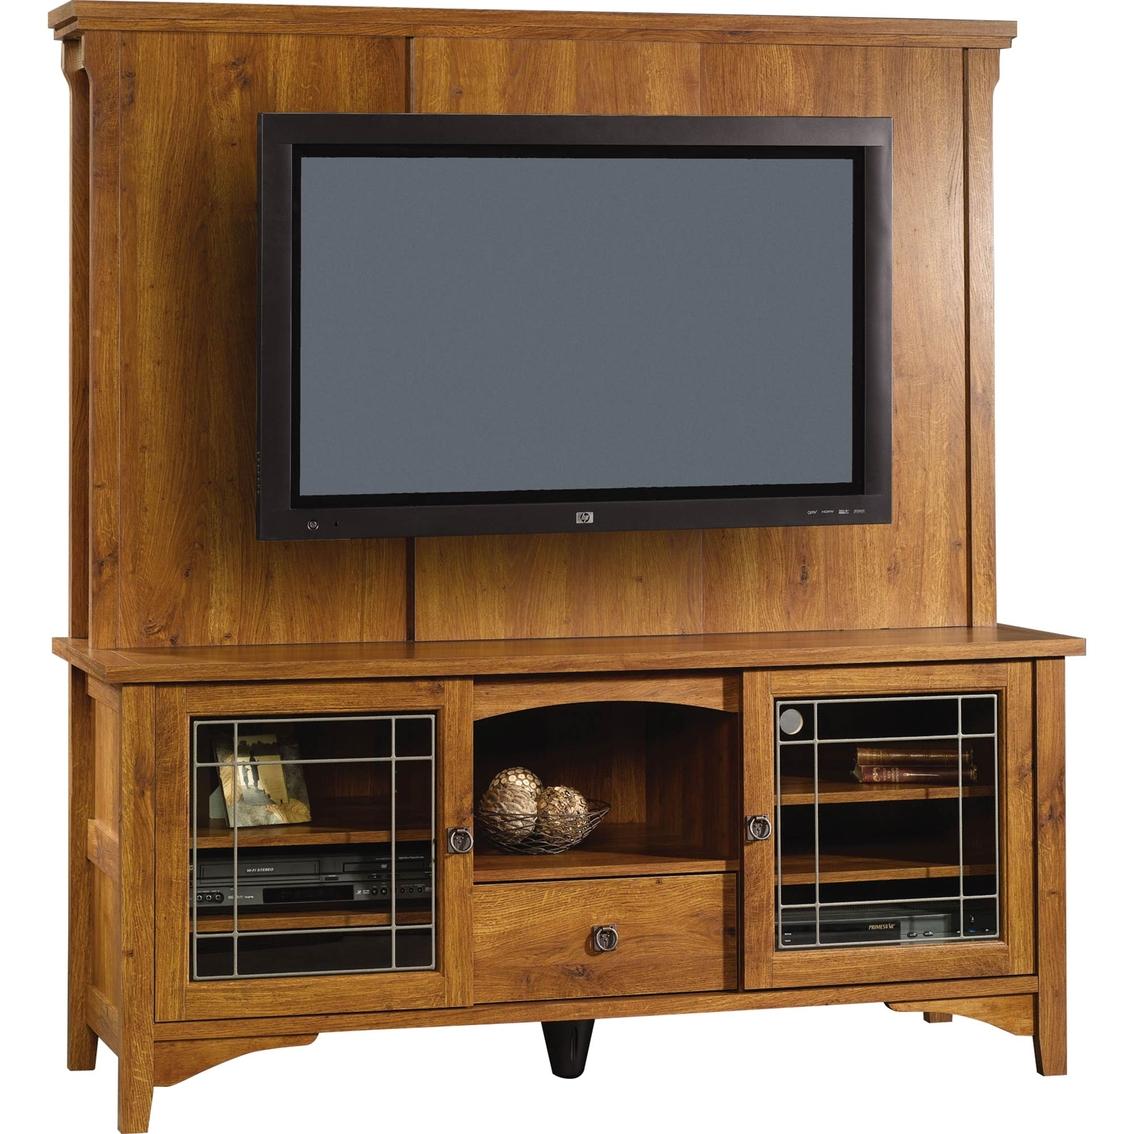 Sauder Rose Valley Entertainment Credenza Media Furniture Home Appliances Shop The Exchange